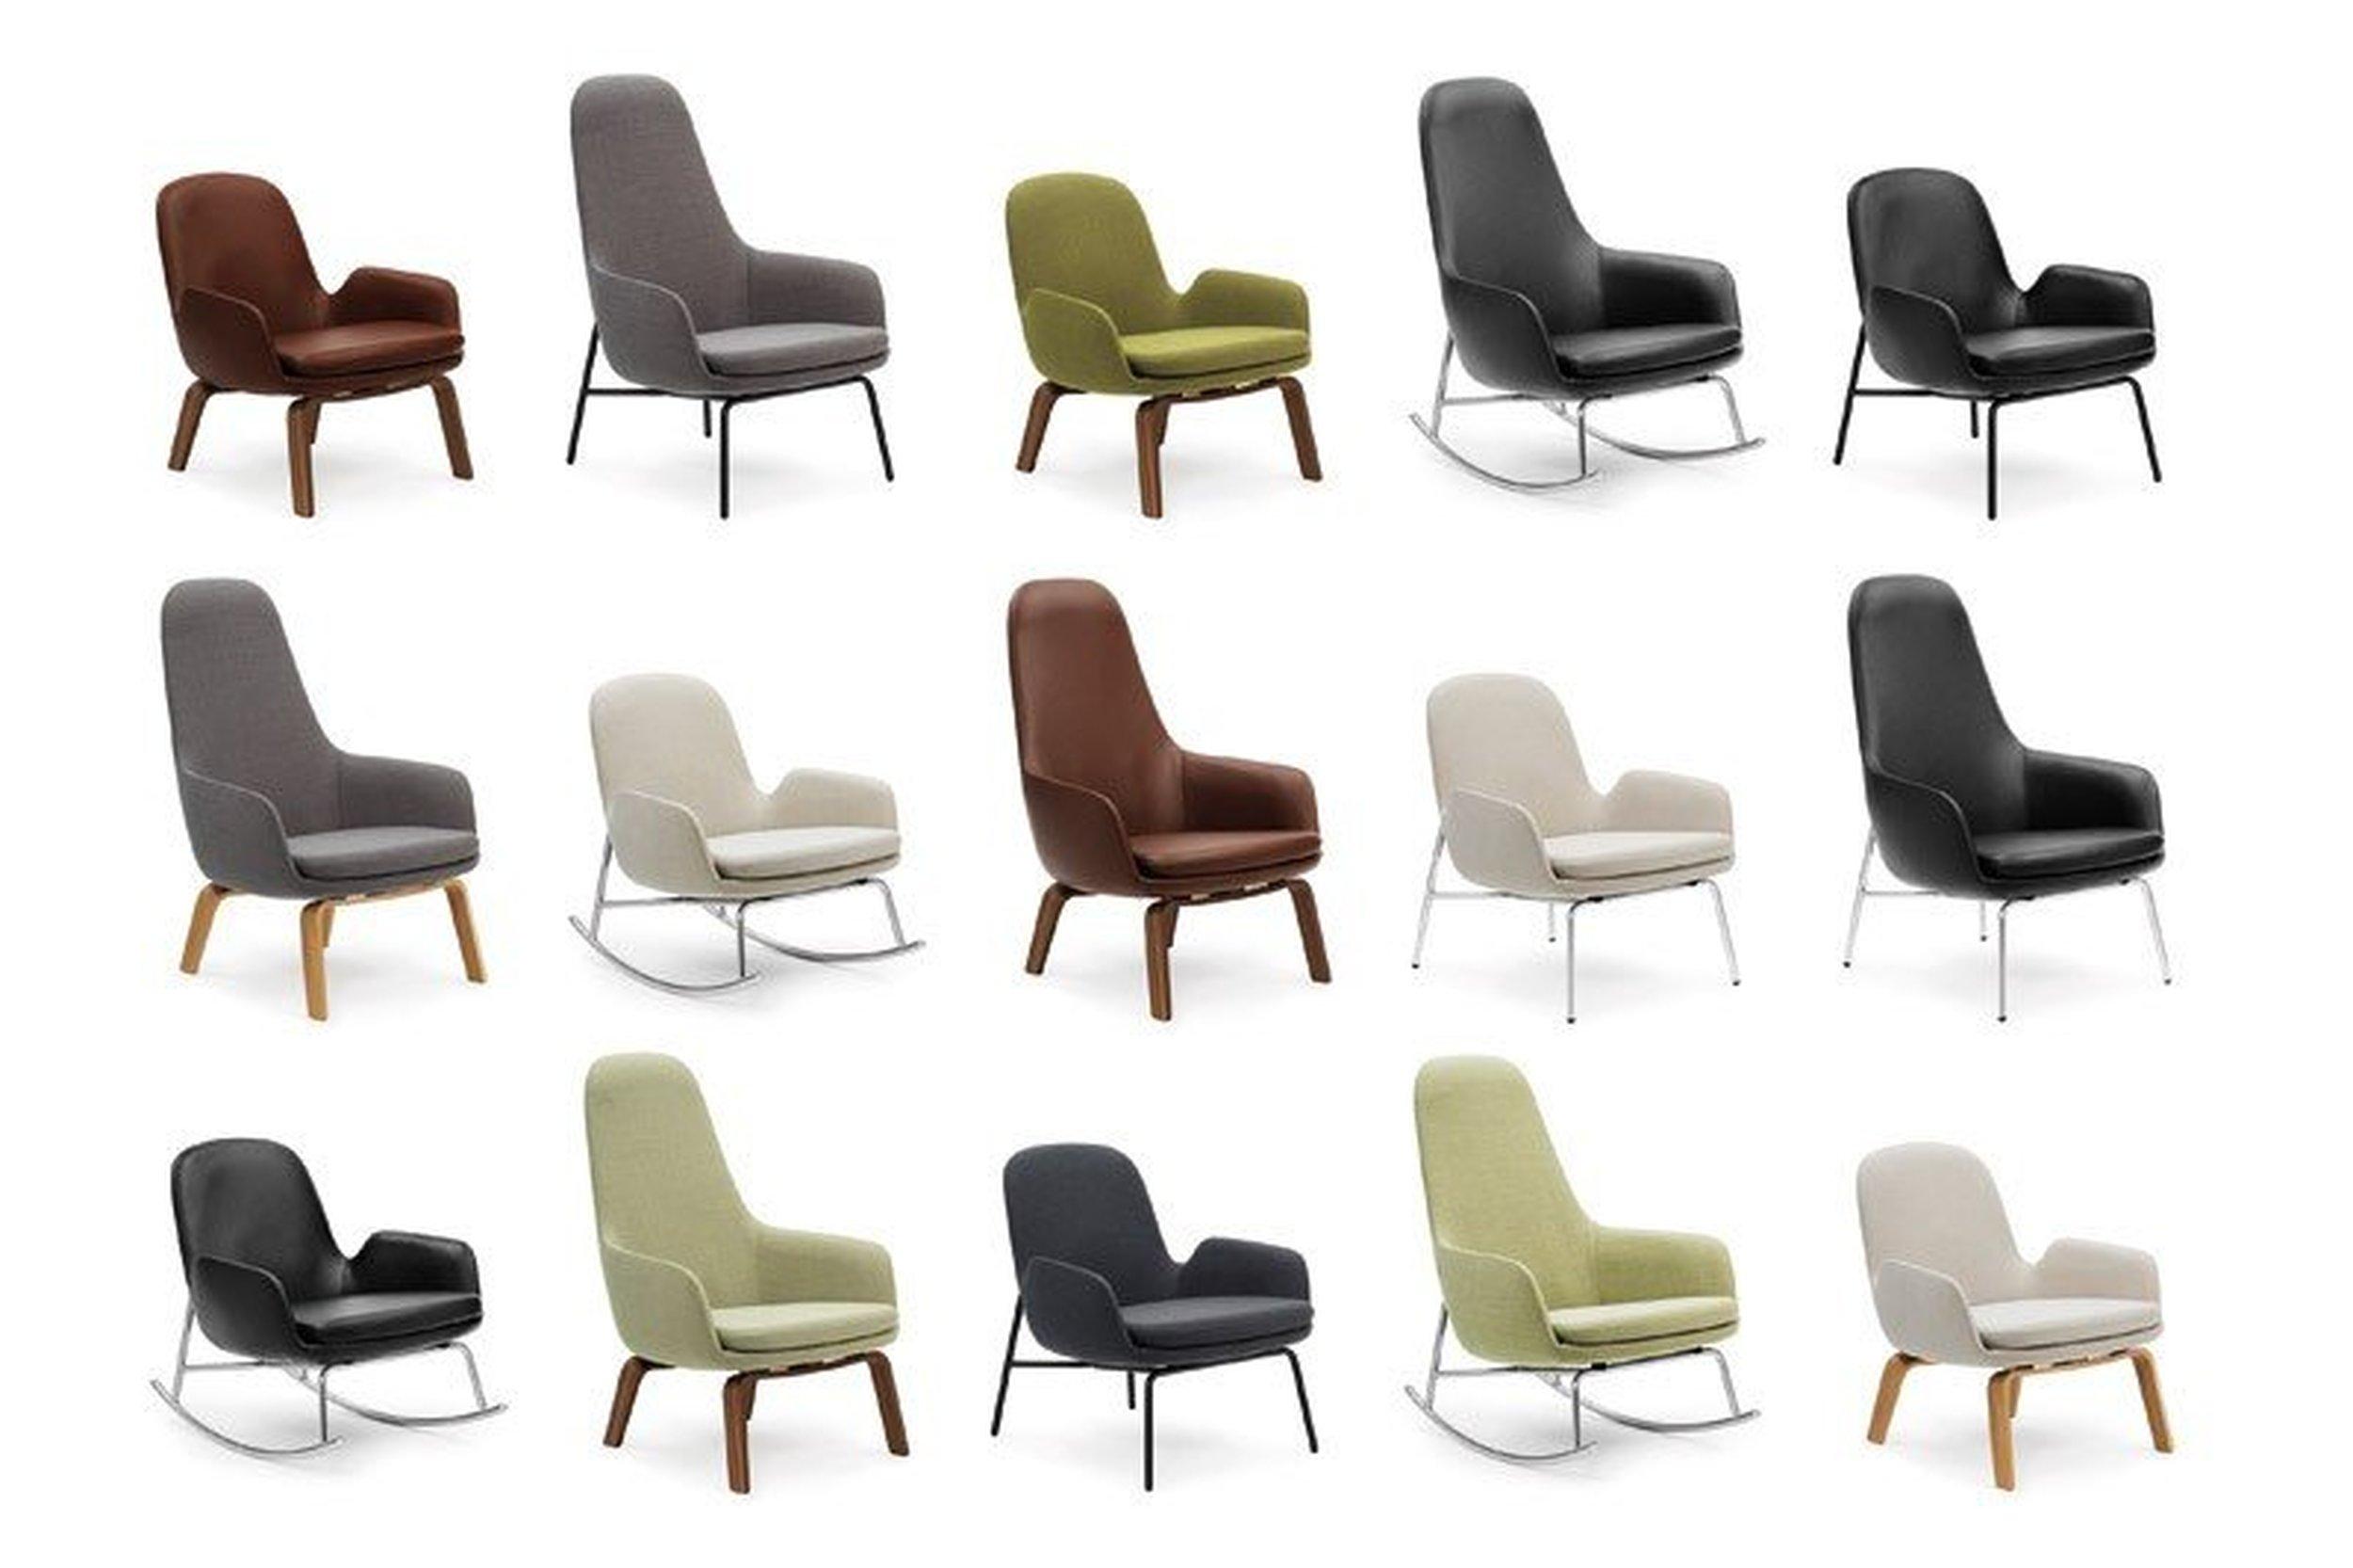 fotel wysoki era na drewnianych nogach normann copenhagen ff. Black Bedroom Furniture Sets. Home Design Ideas